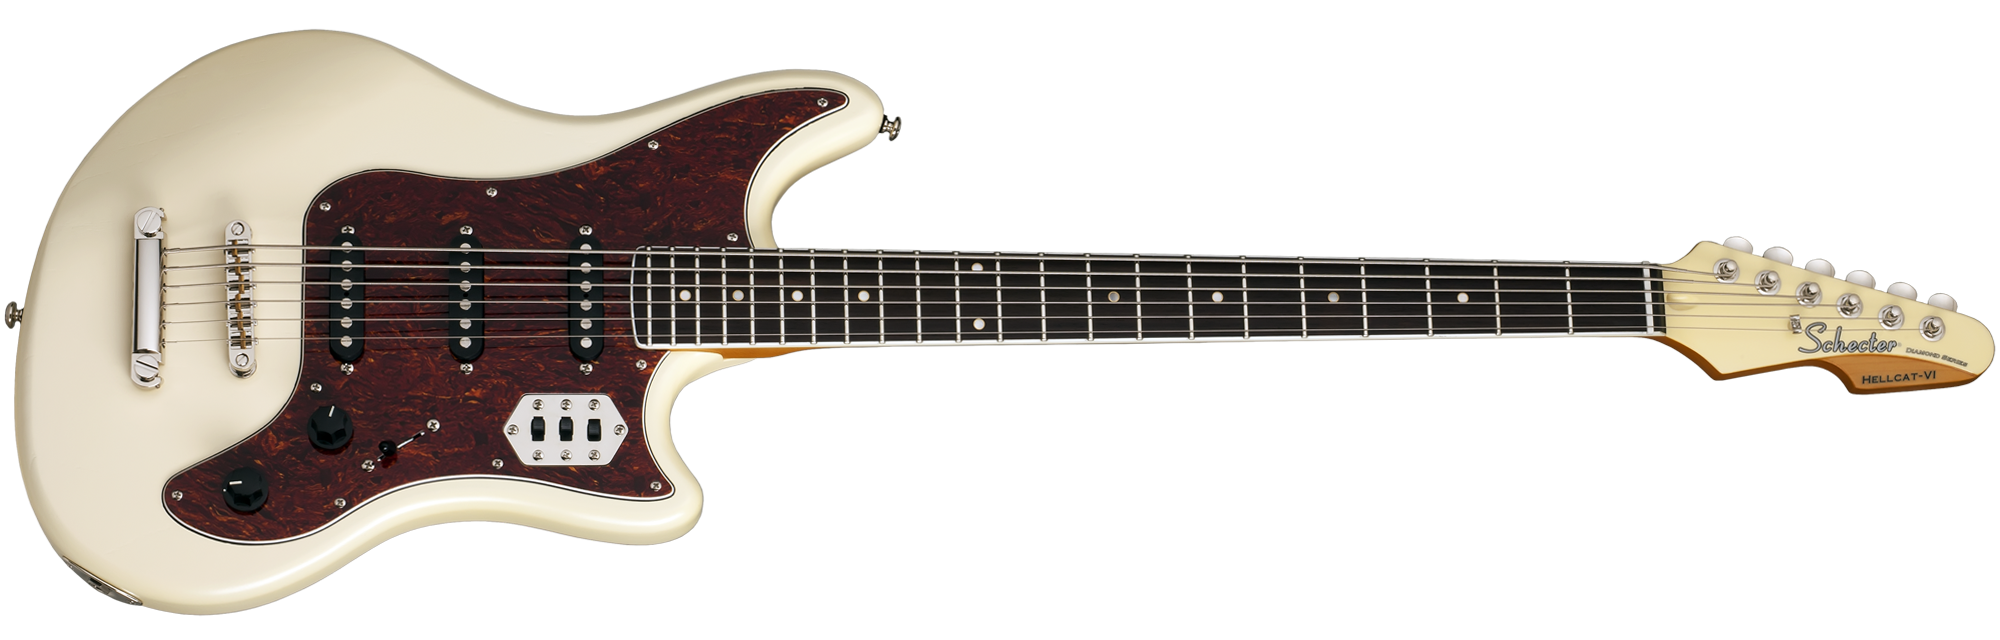 Hellcat-VI Ivory Pearl (IVYP) SKU #294